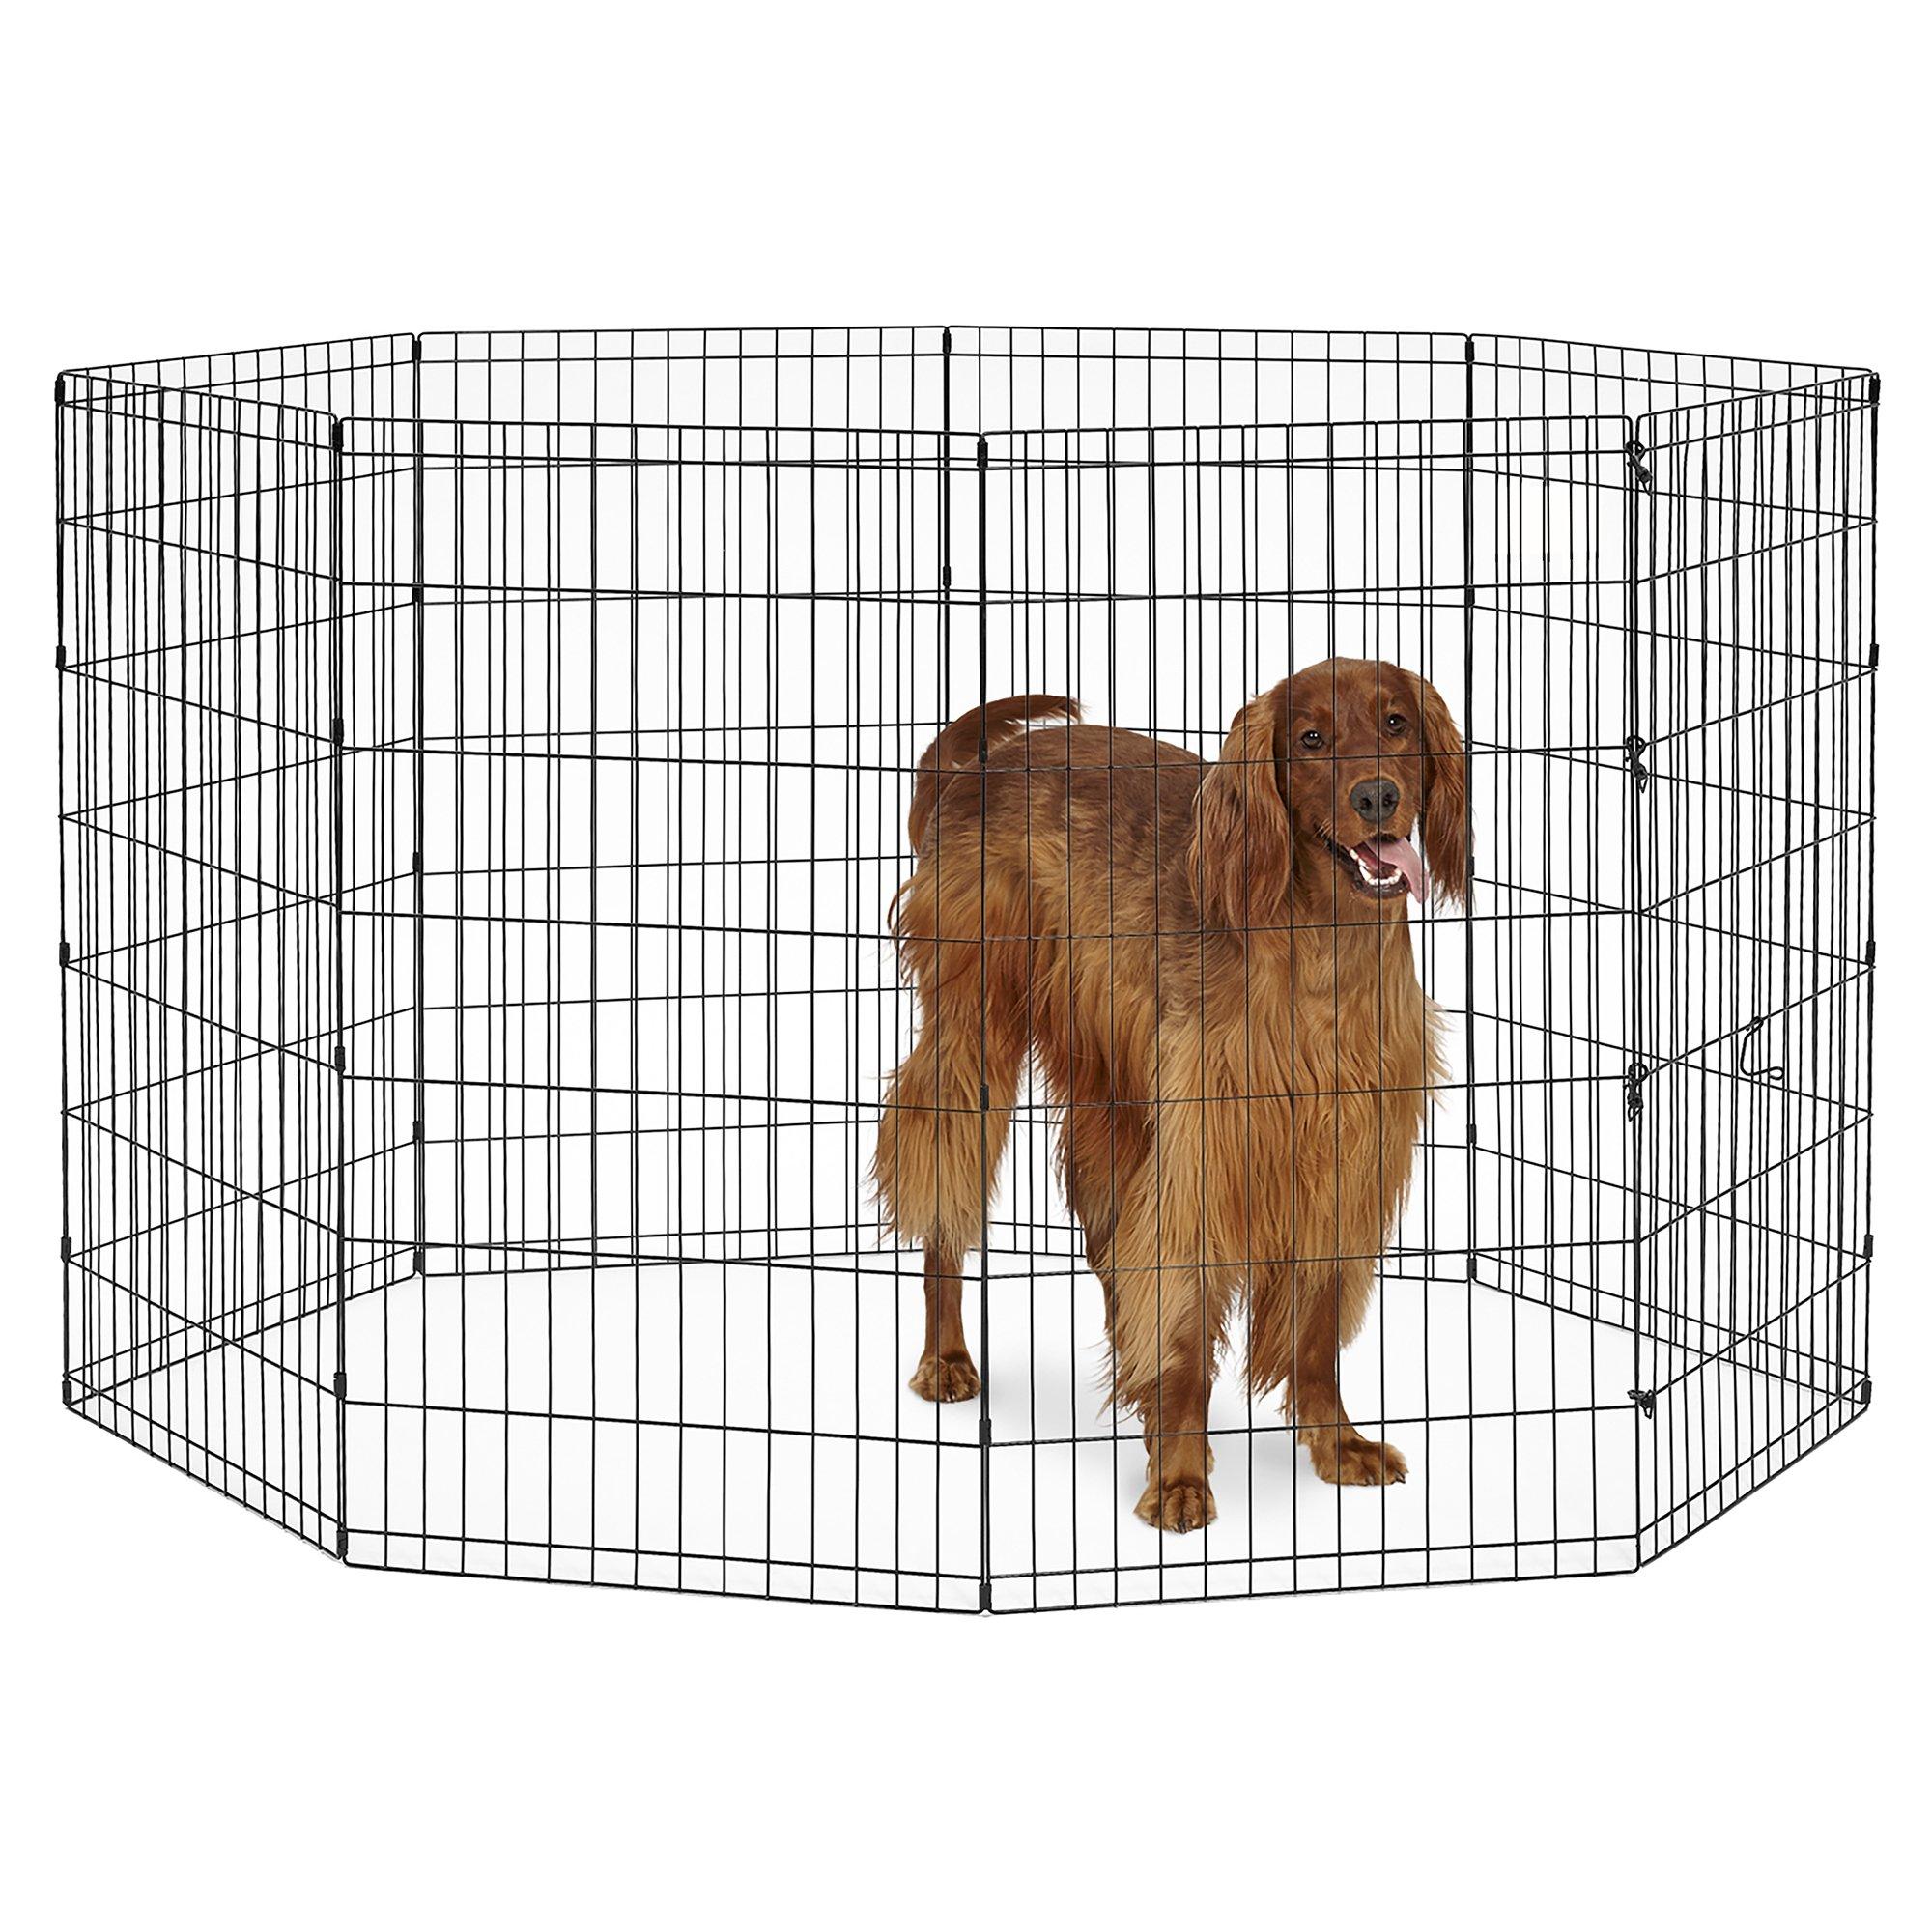 New World Pet Products B556-42 Foldable Exercise Pet Playpen, Black, Large/24'' x 42''